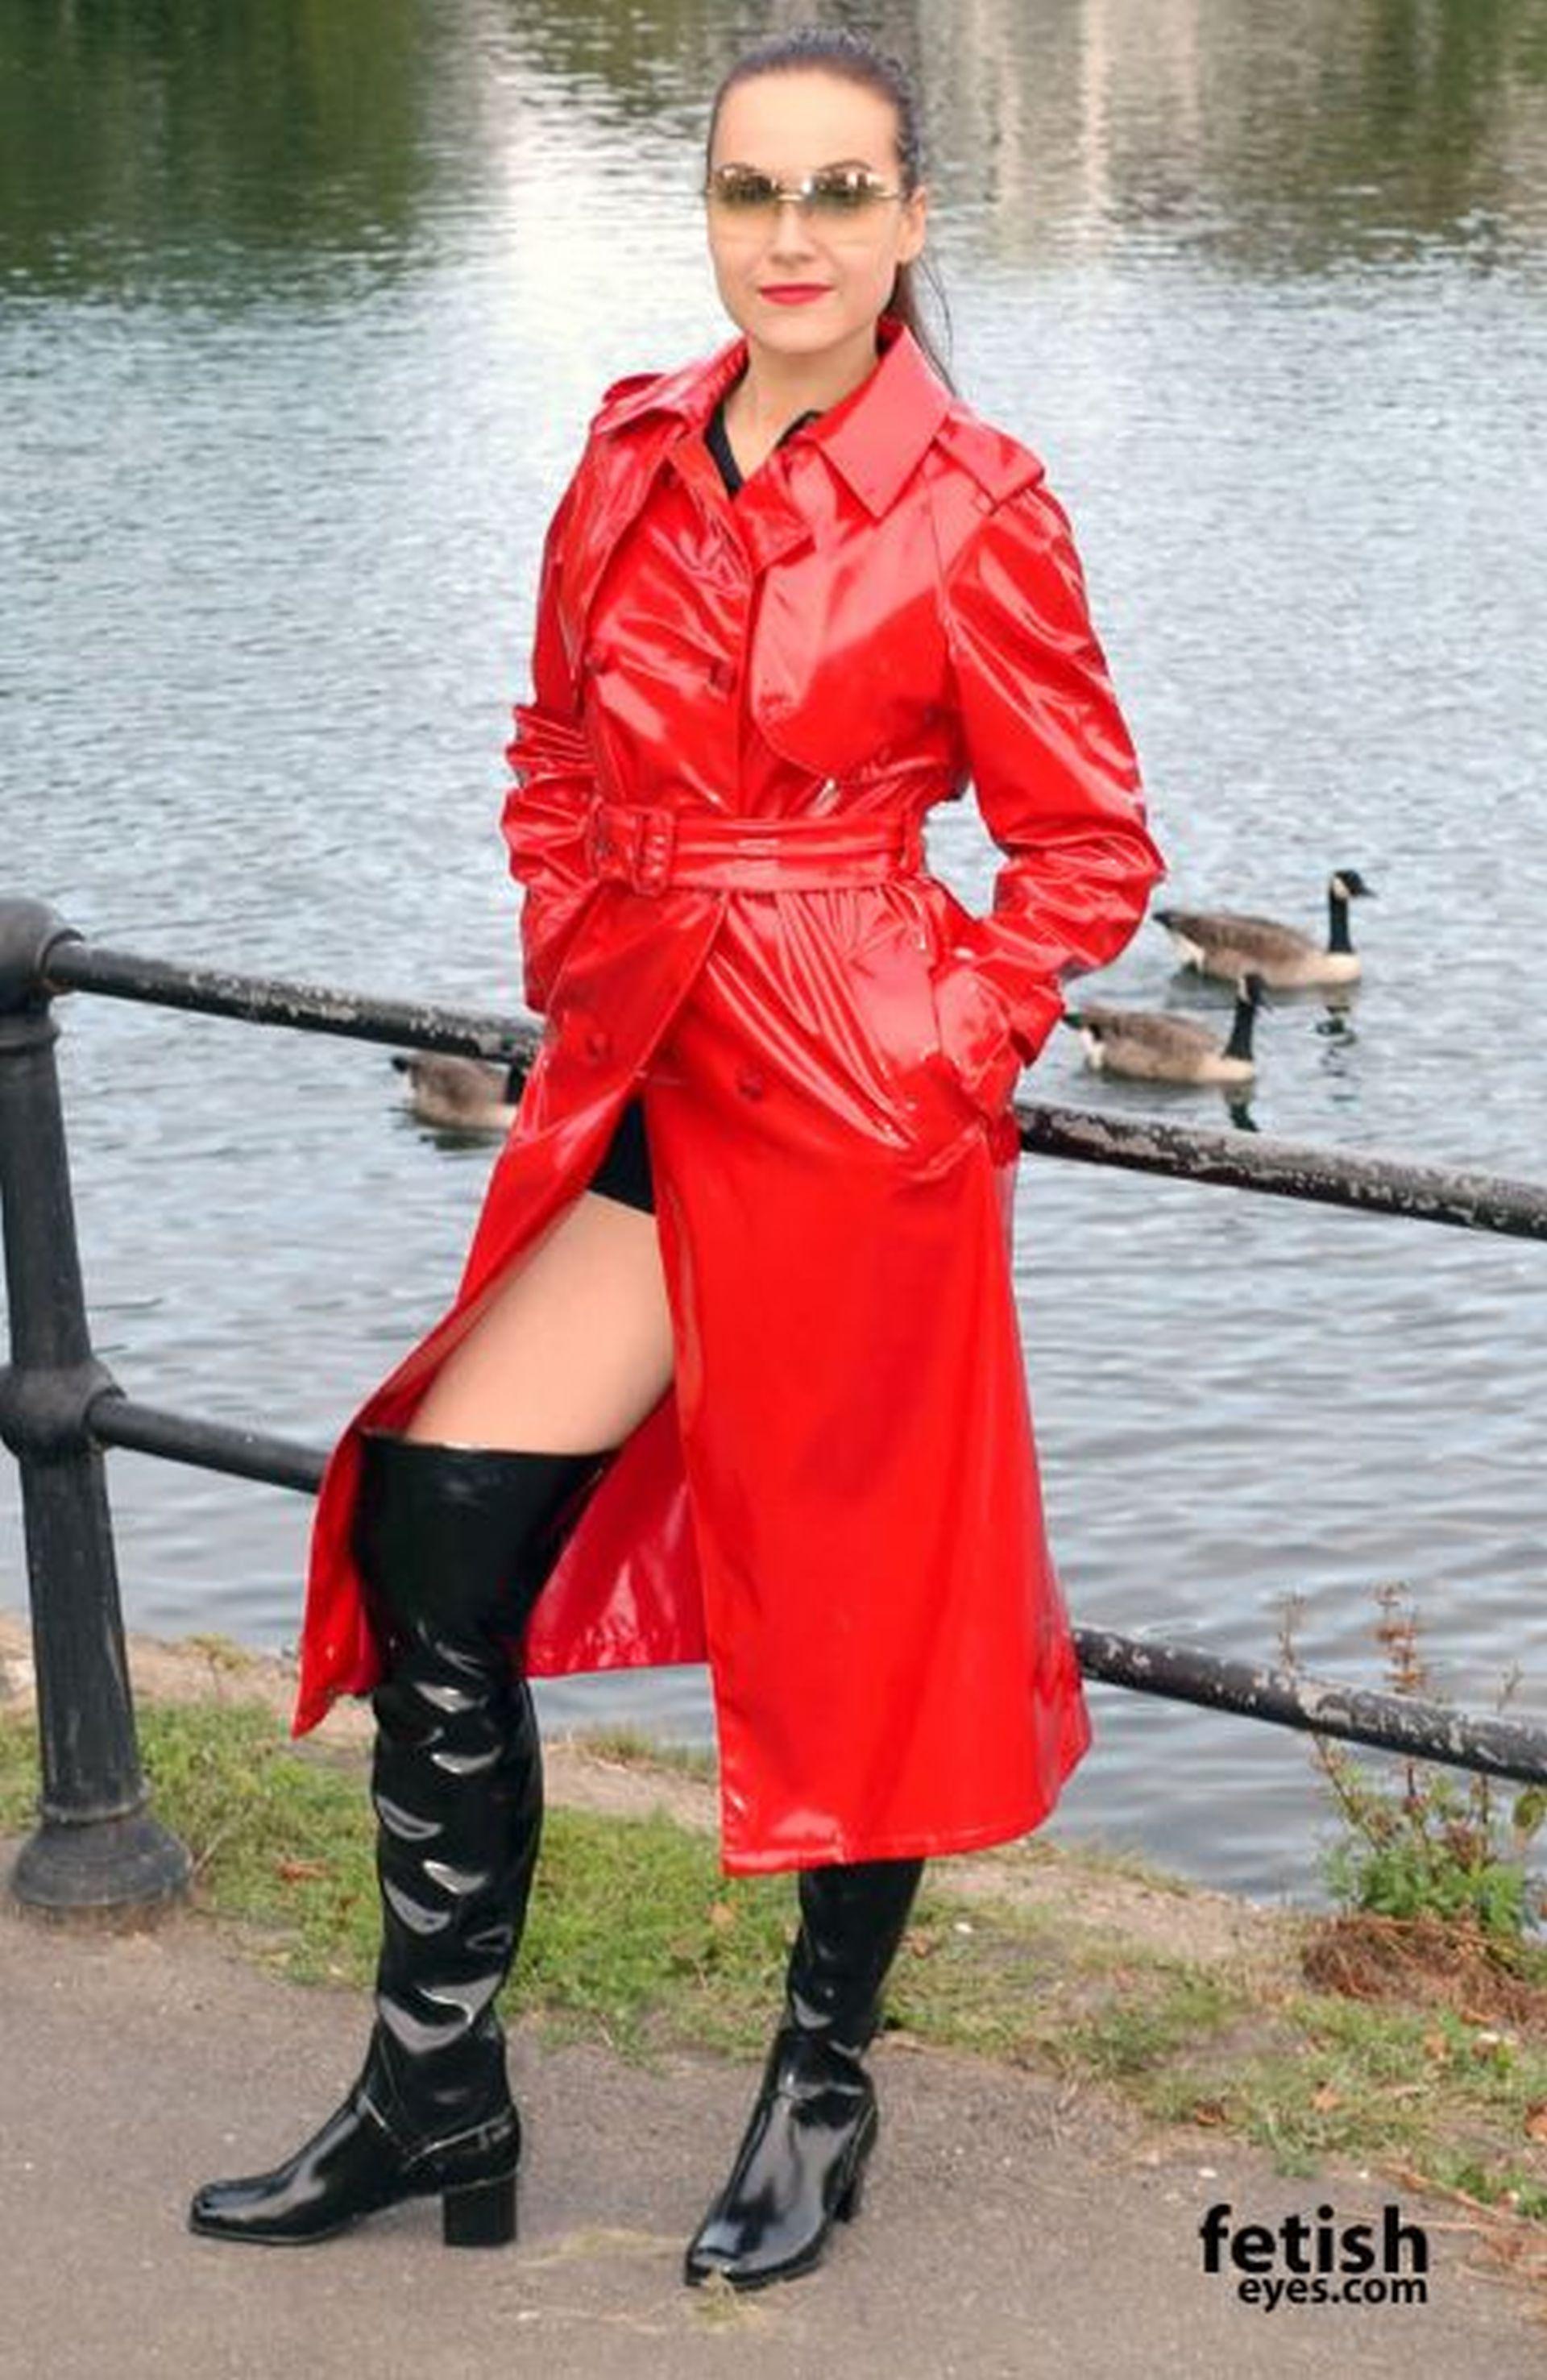 Roter Lackmantel | Rain wear, Red raincoat, Fashion